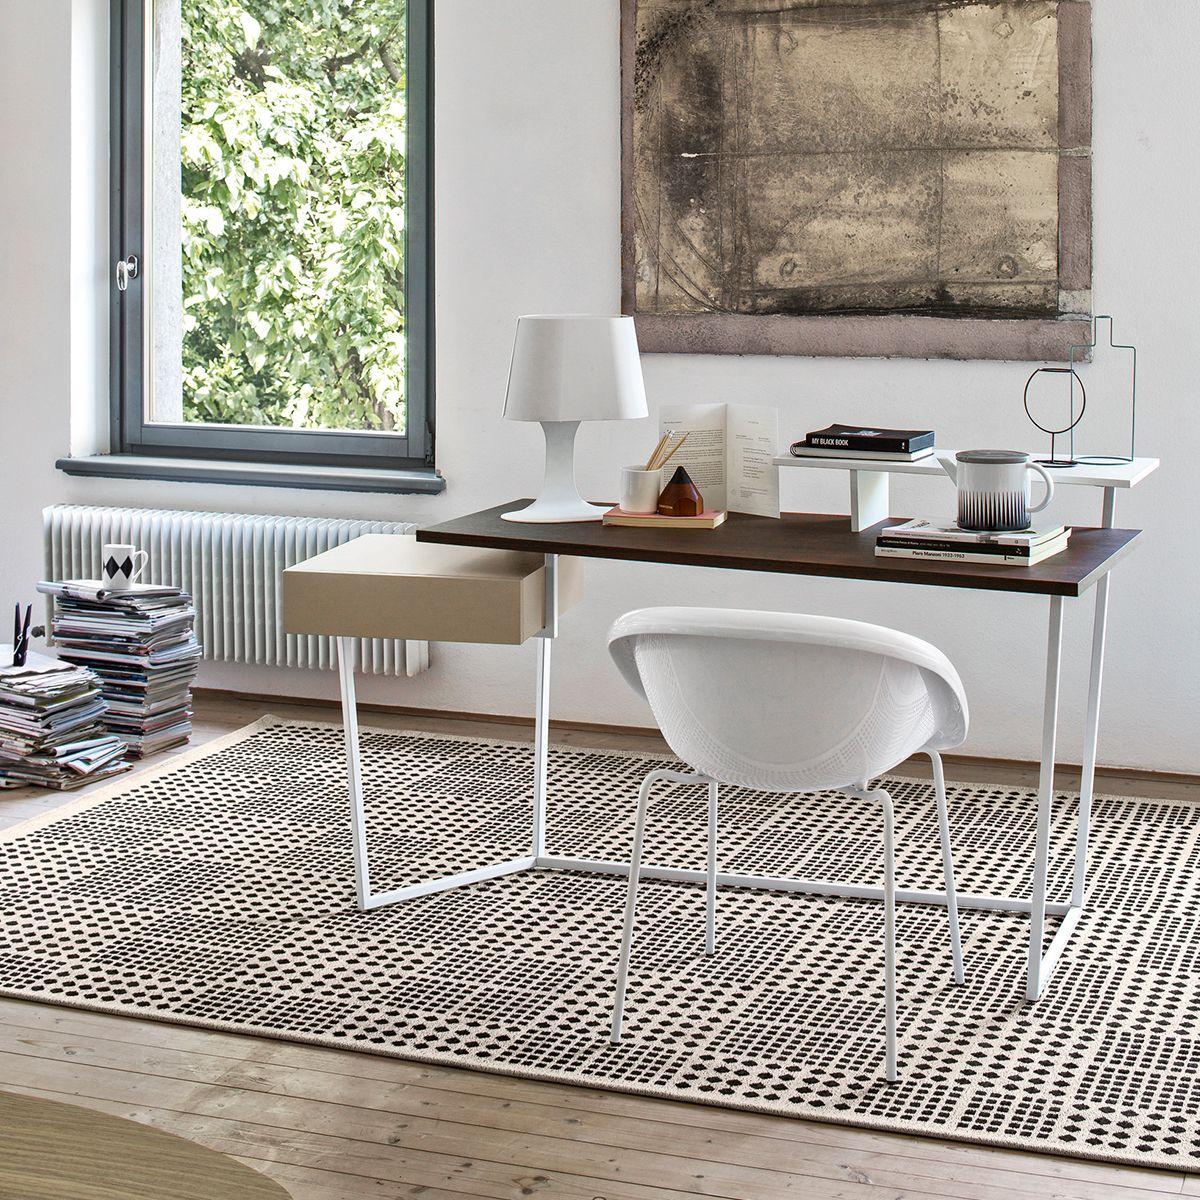 Tavolino Element Calligaris Prezzo.The Layers Desk Combines Colour And Shape For A Contemporary And